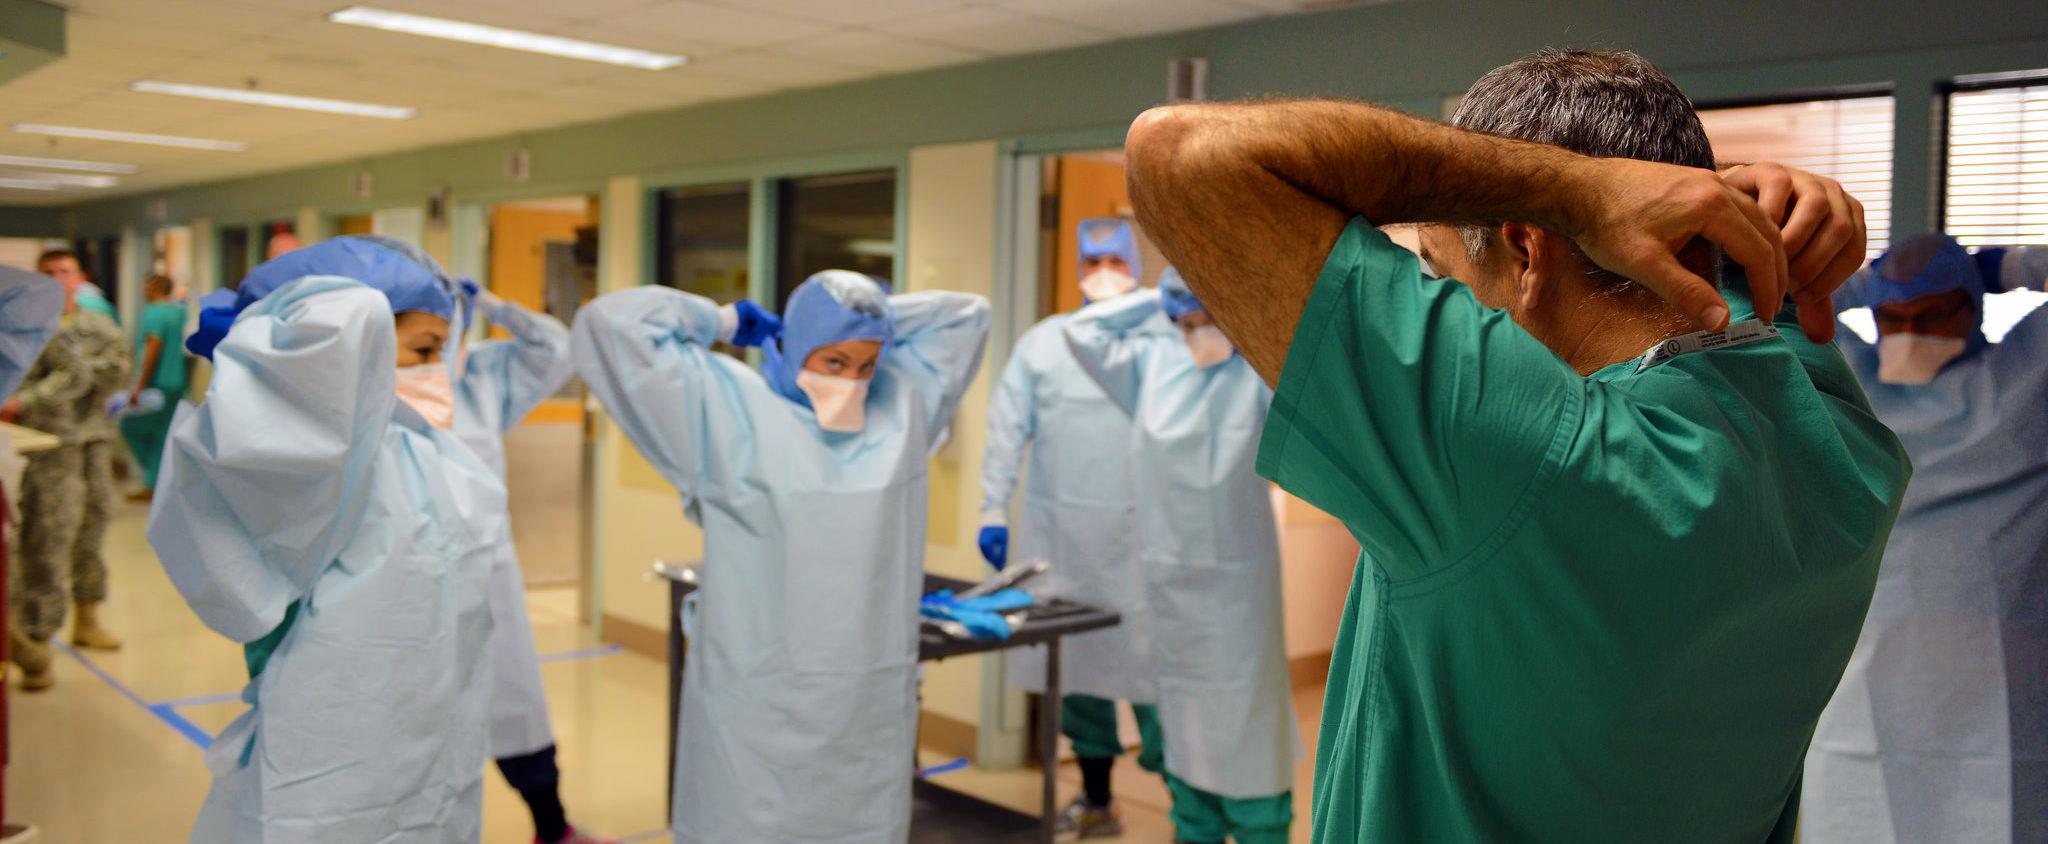 Ebola Research Database. Photo cred - Army Medicine, Ebola response training